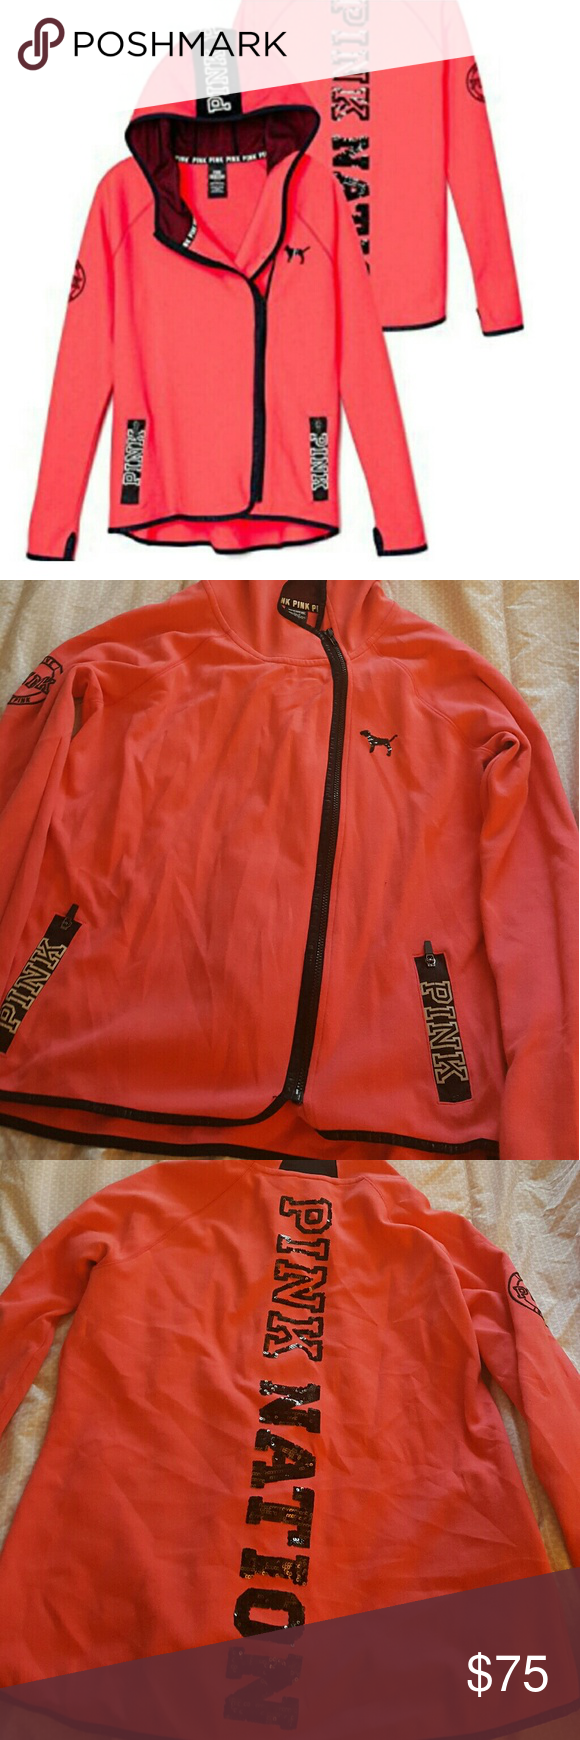 Pink- Side zipper-  Large 2015 VS Fashion show side zipper sweatshirt. EUC worn 3 times. PINK Victoria's Secret Tops Sweatshirts & Hoodies